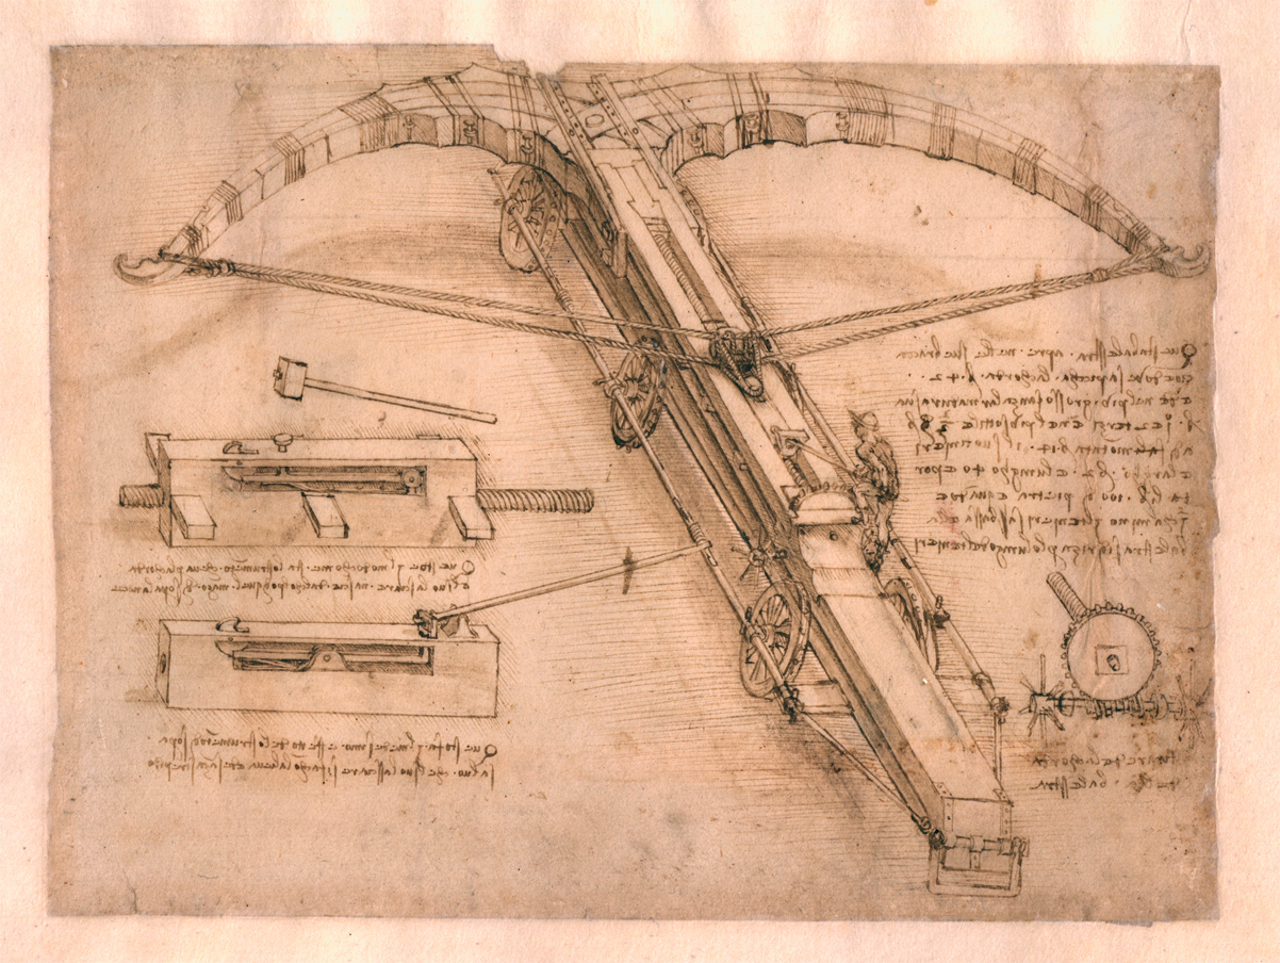 Drawing of a giant crossbow by Leonardo da Vinci (Circa 1485–92)